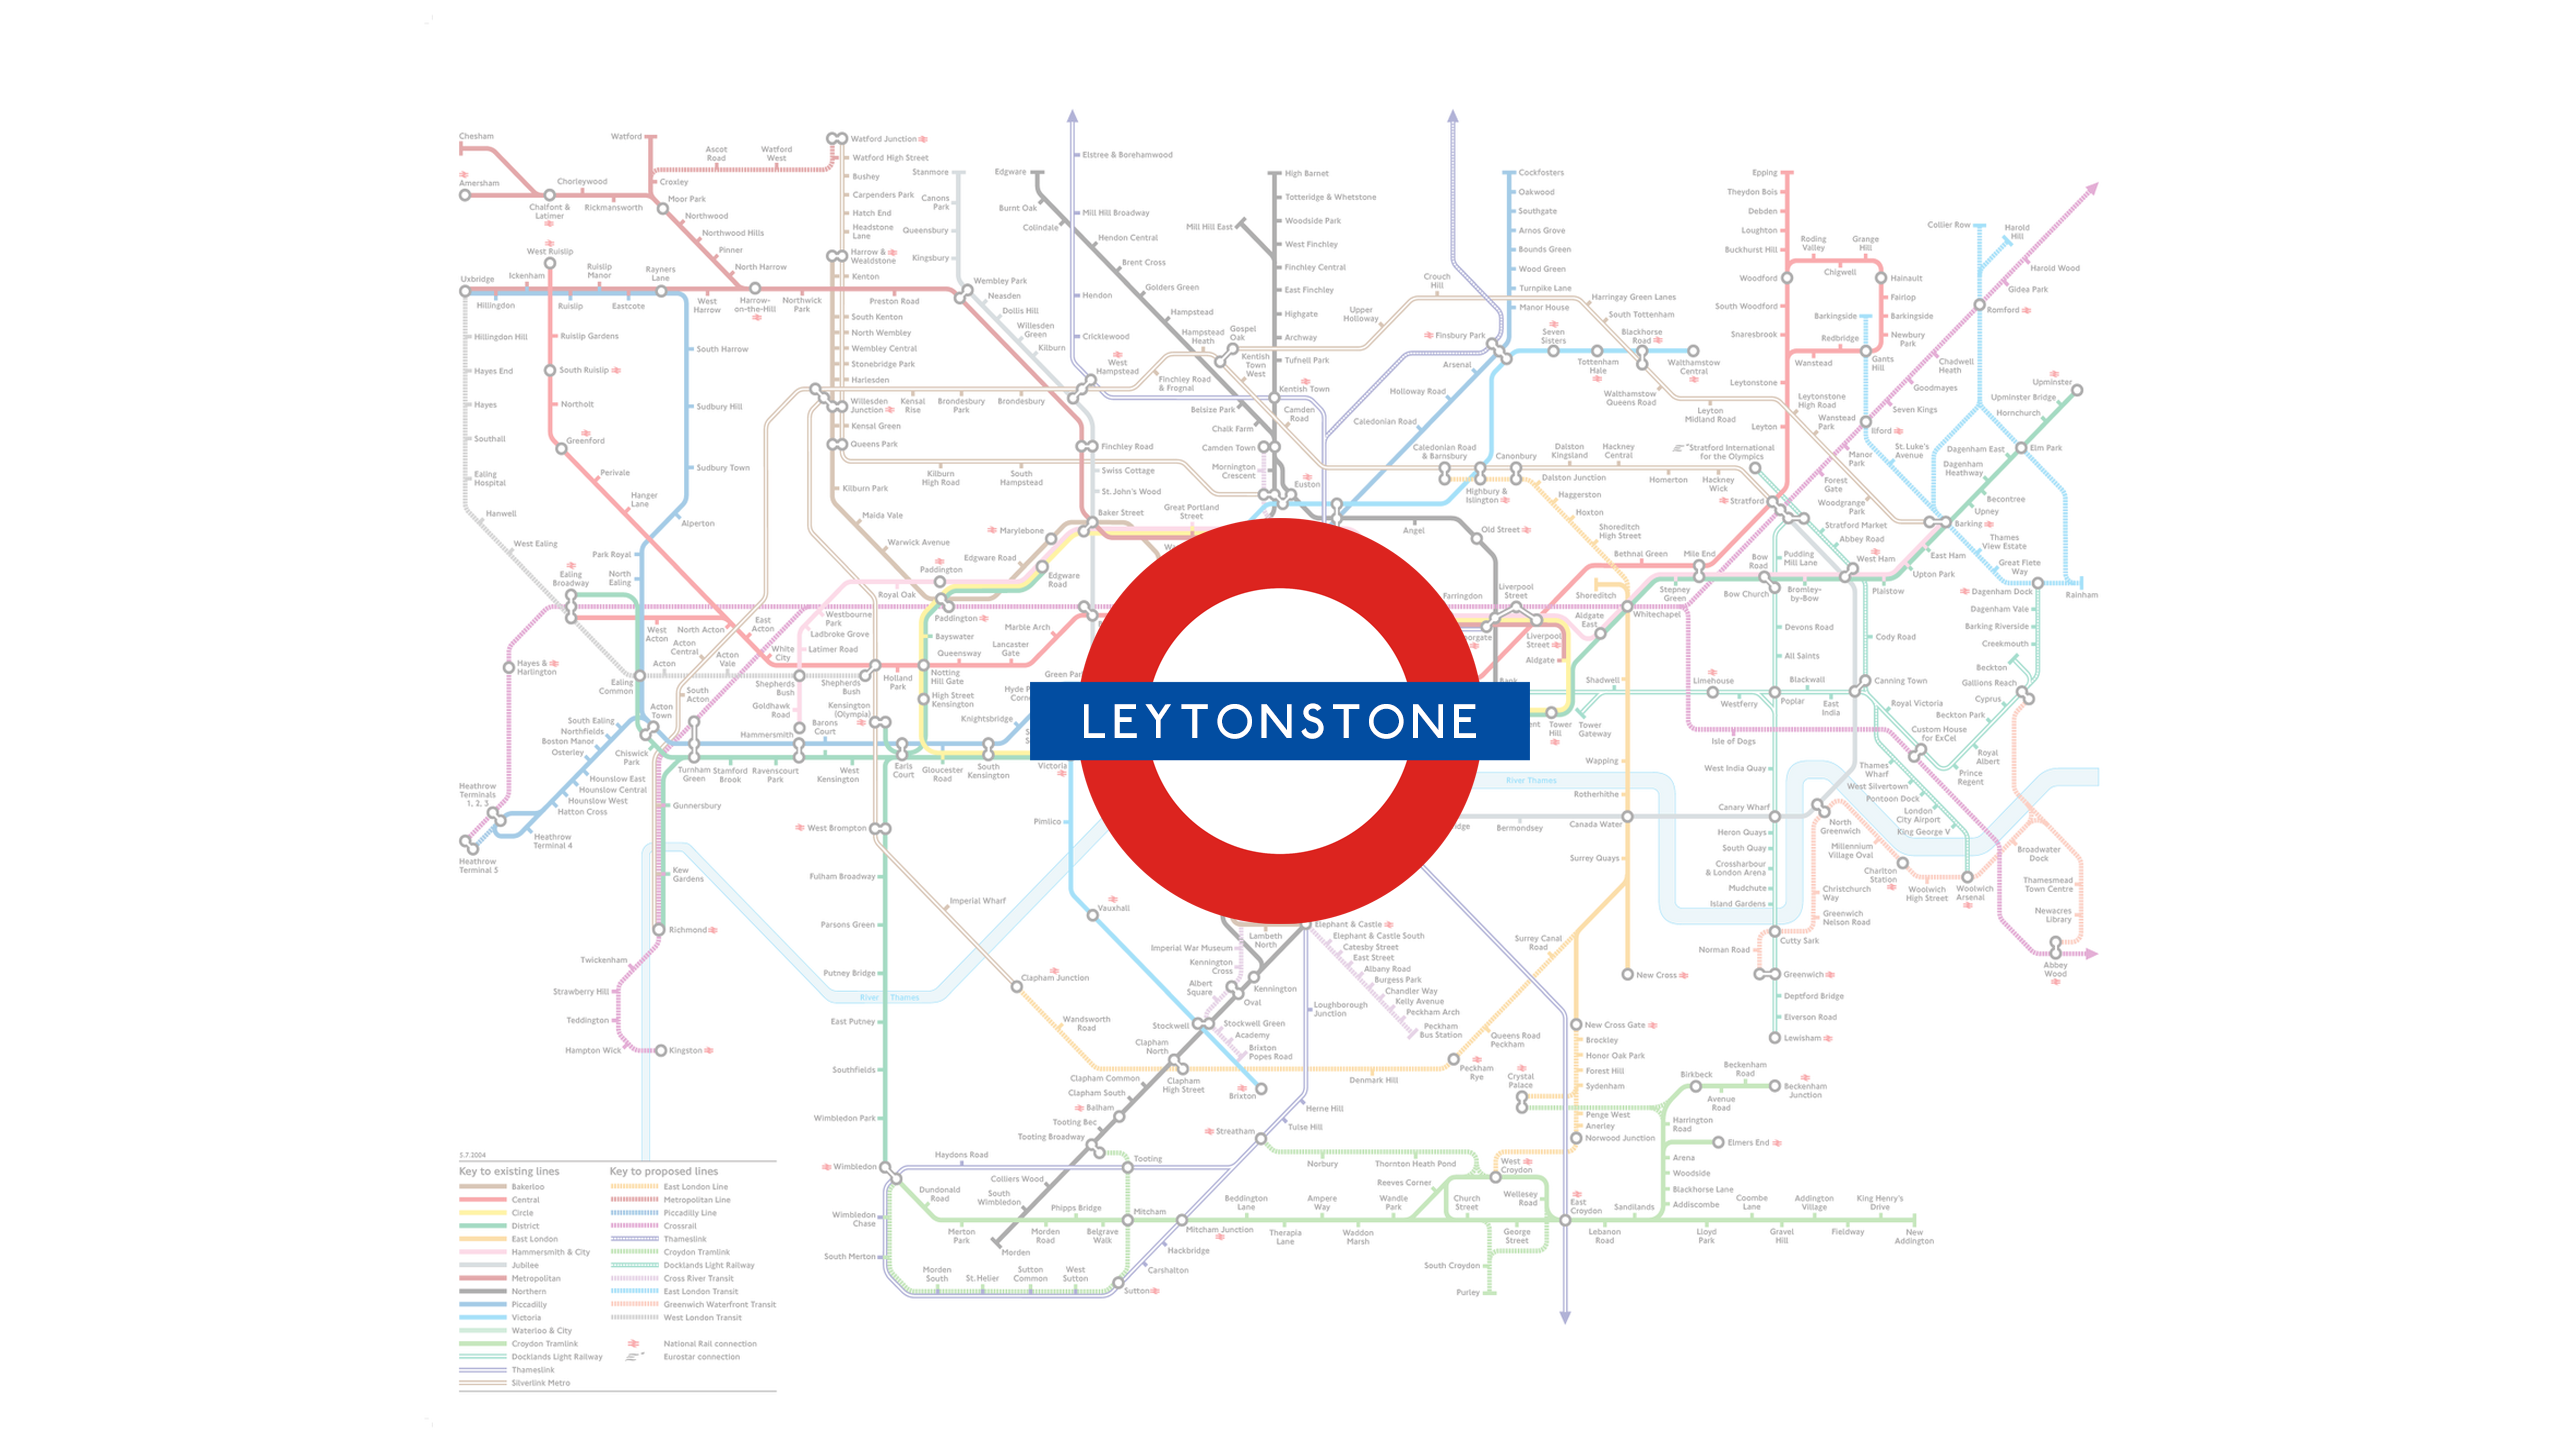 Leytonstone (Map)